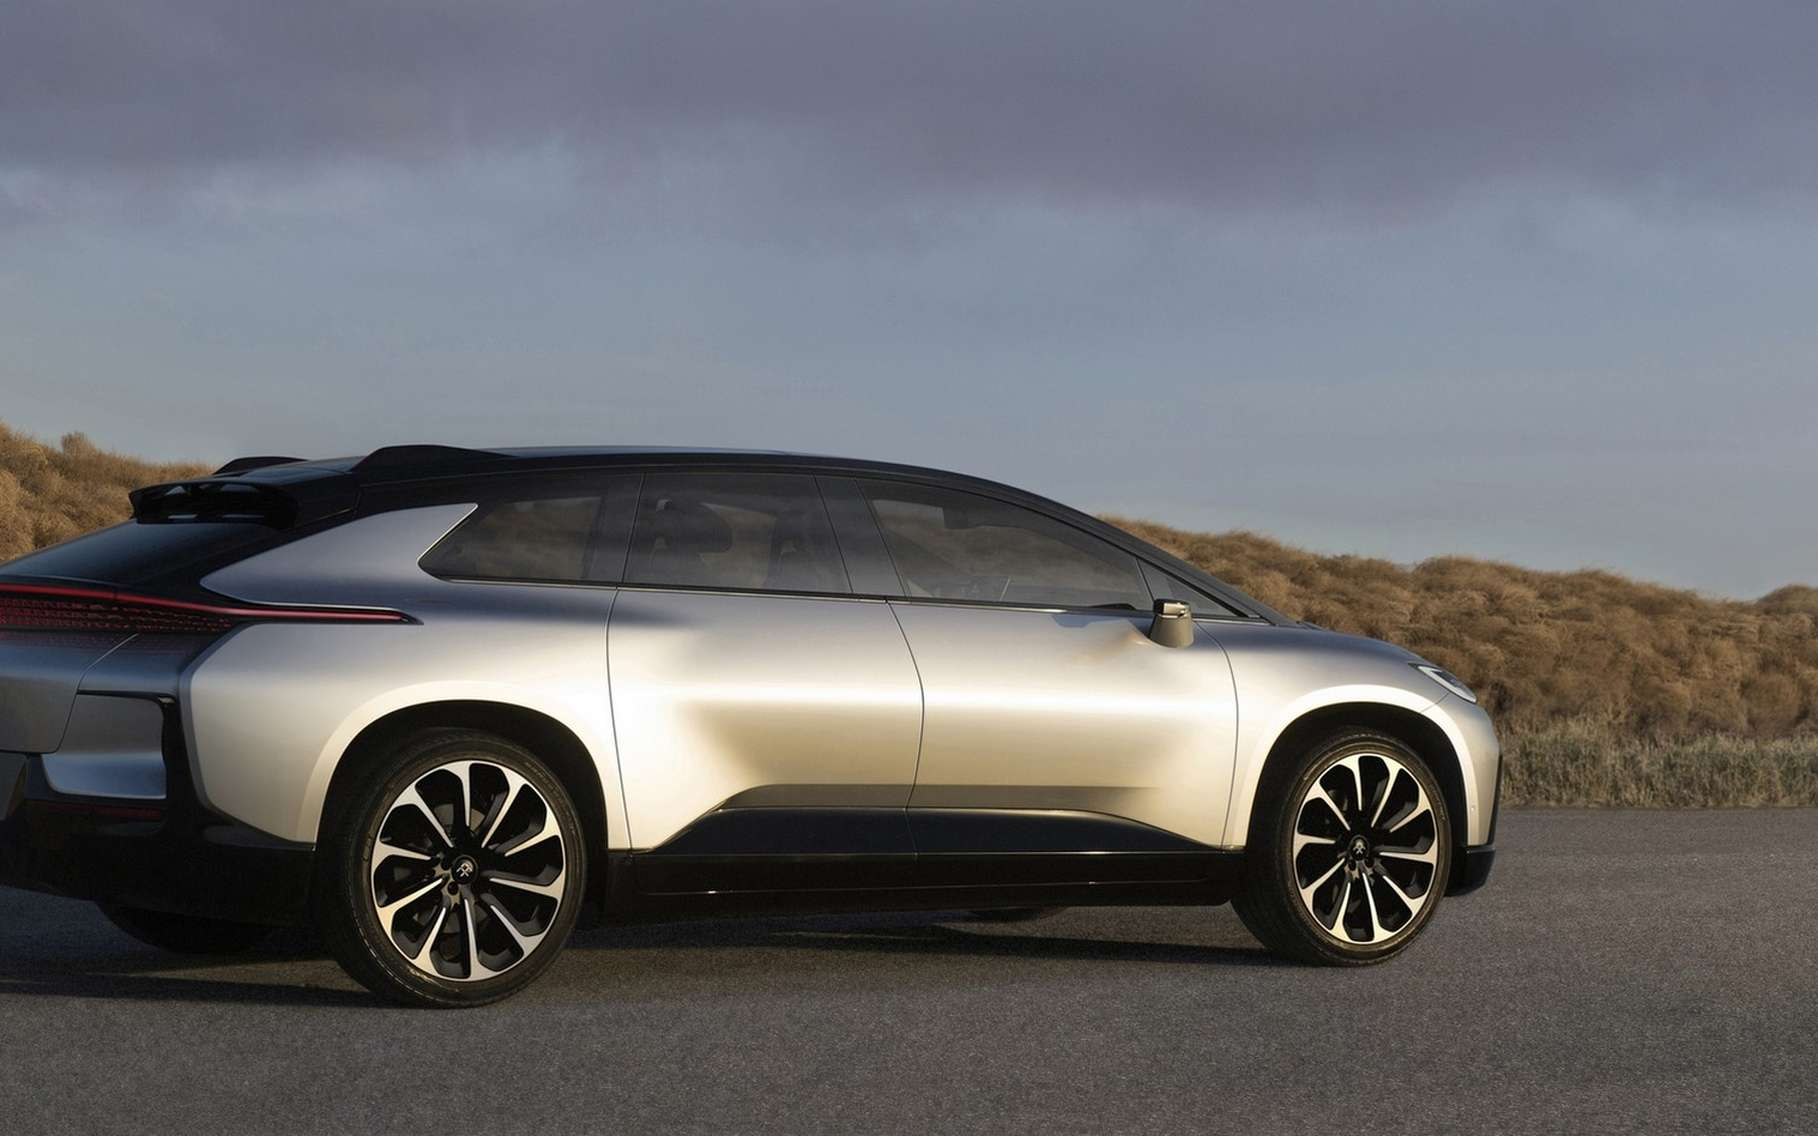 La FF 91 de Faraday Future est un SUV électrique. © Faraday Future